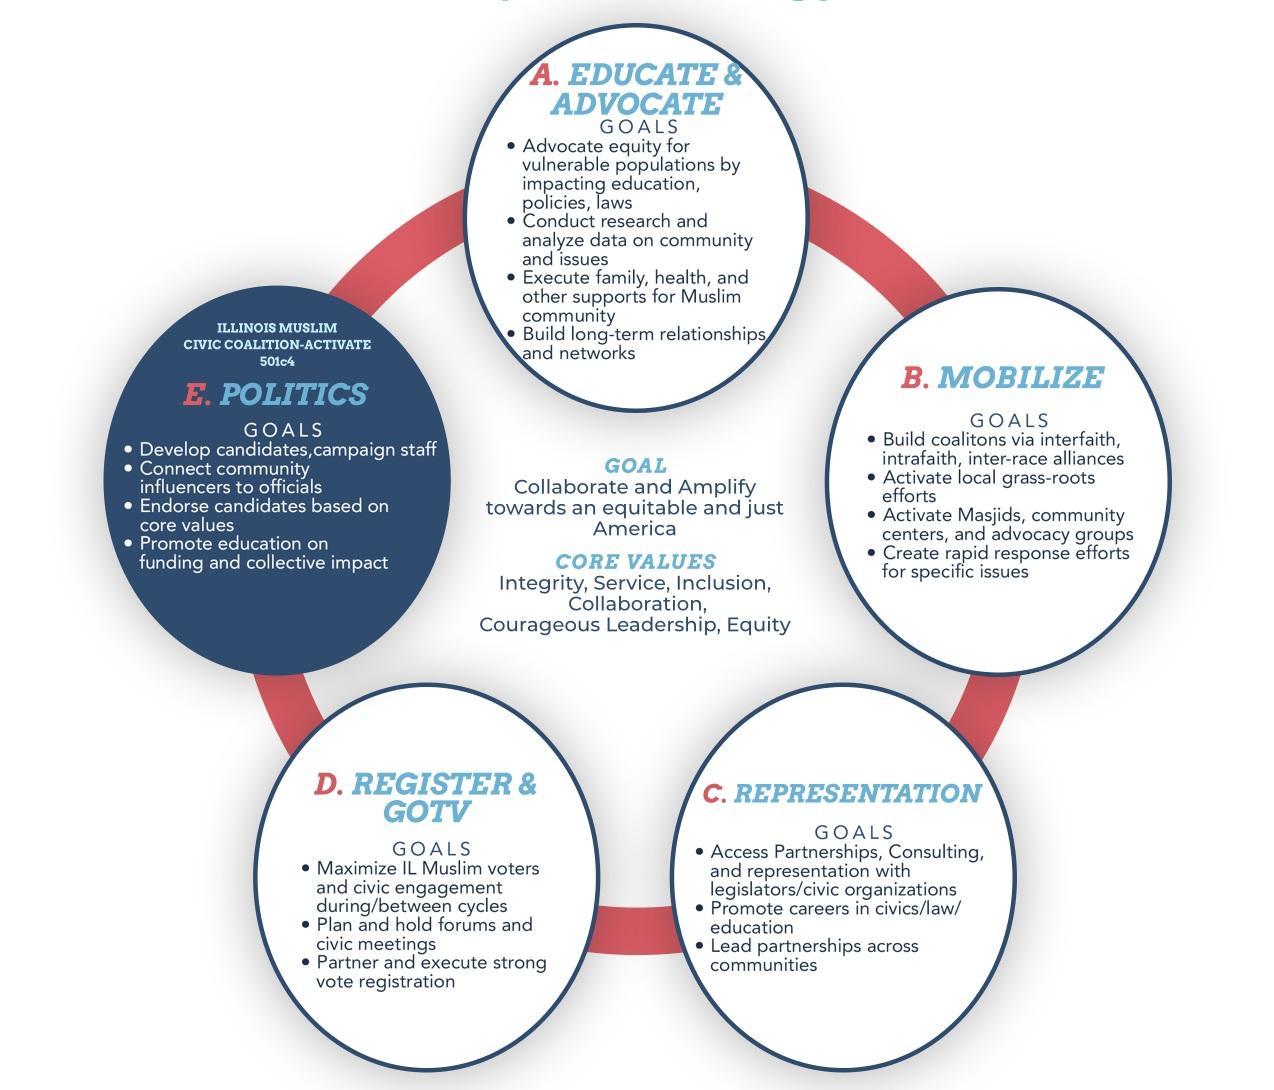 Illinois+Muslim+Civic+Coalition+Strategy+20190227+copy.jpg